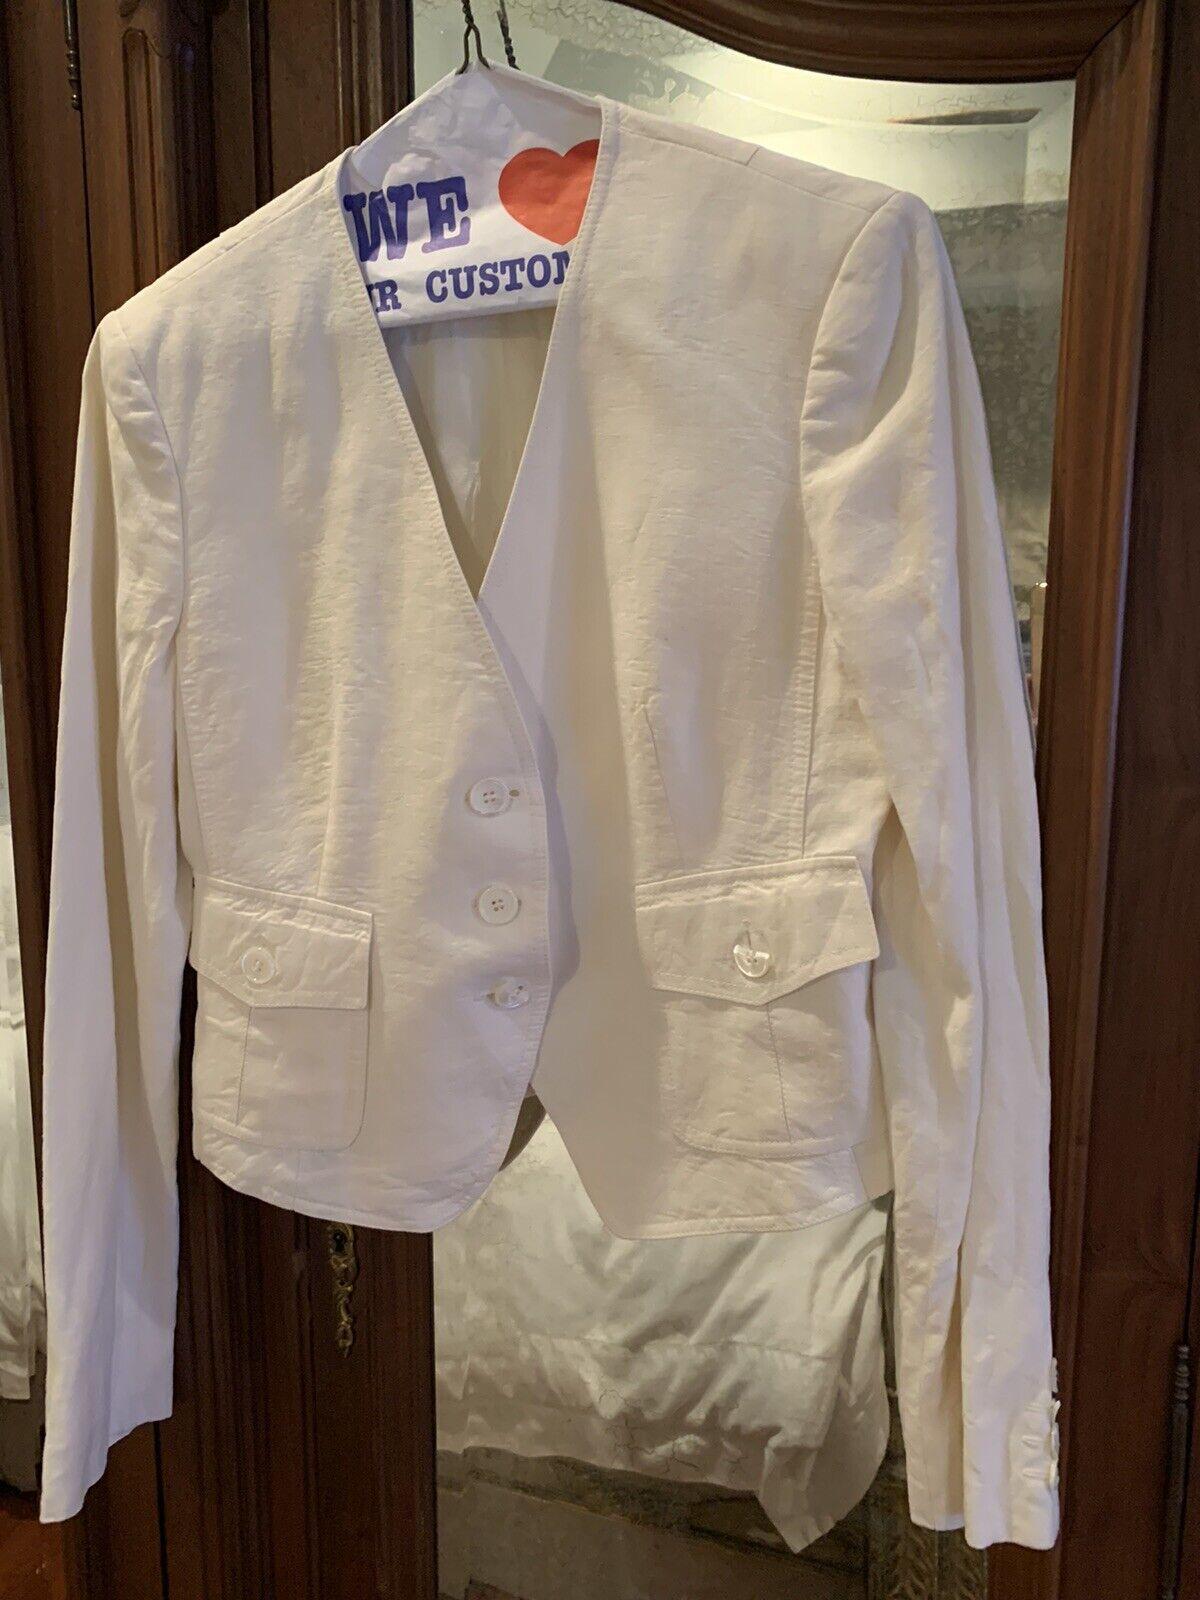 Cream Linen Michael Kors Suit - image 1